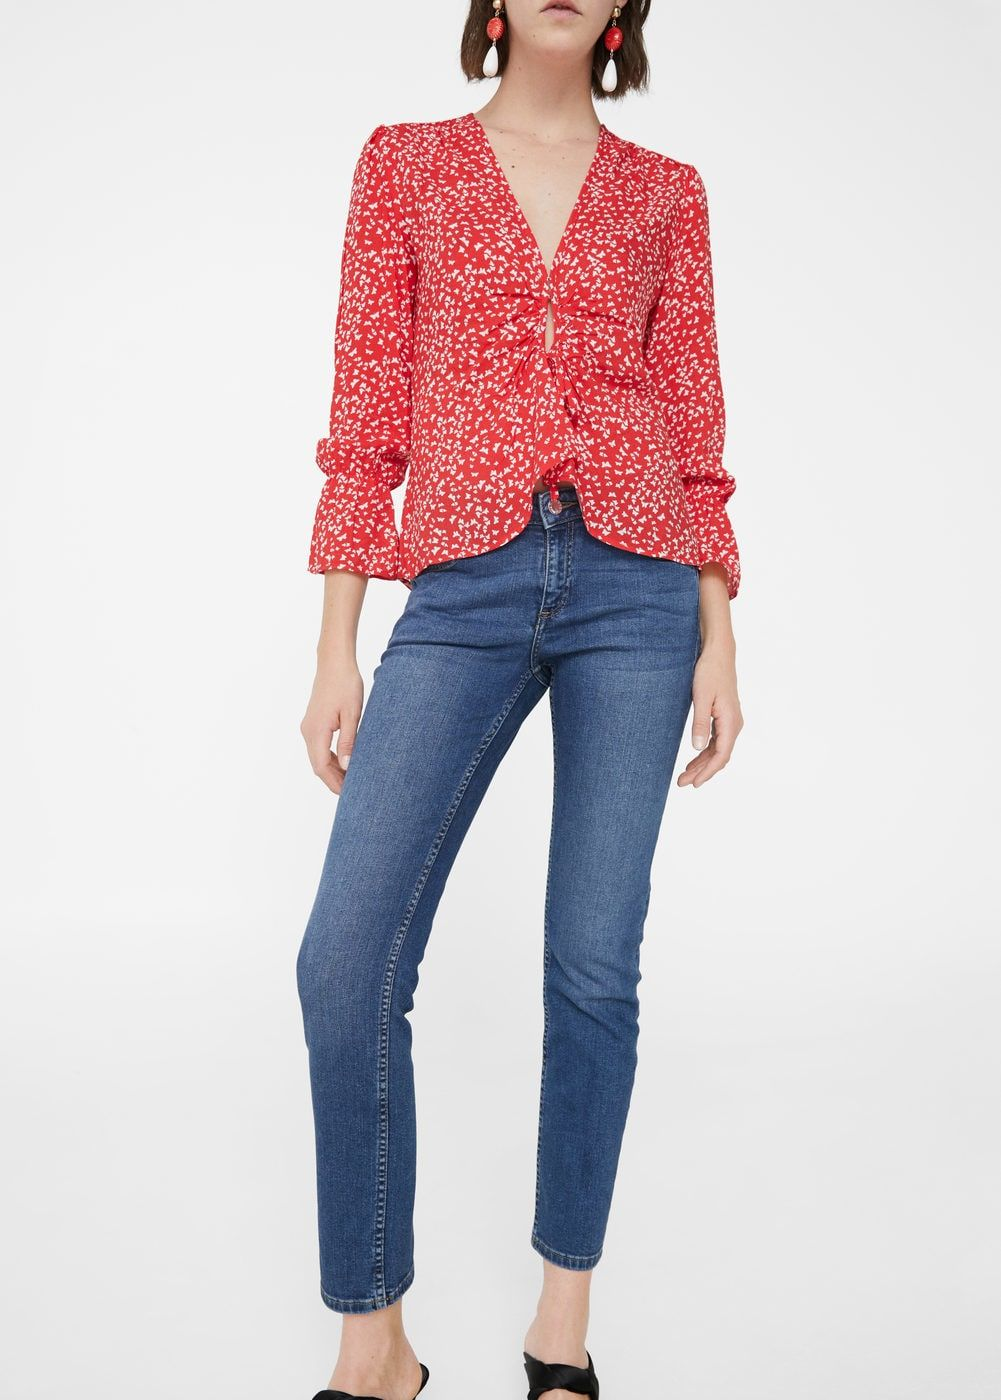 7a3e6fae1d Jeans straight alice - Jeans de Mujer